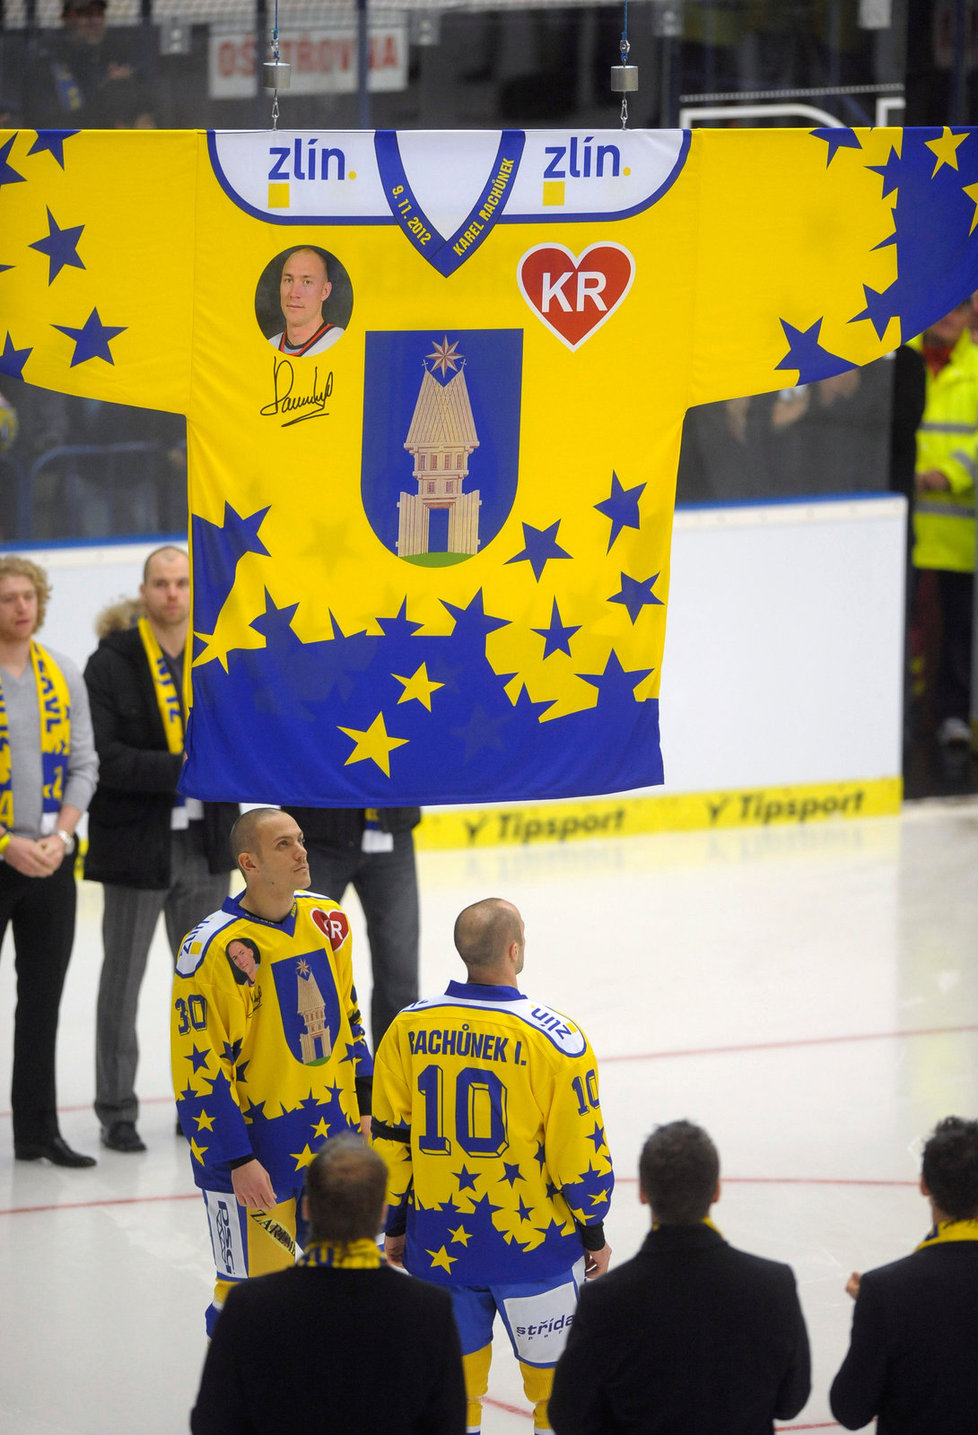 Bratři tragicky zesnulého Karla Rachůnka Tomáš (vlevo) a Ivan poslali ke stropu haly památkový dres s číslem 4